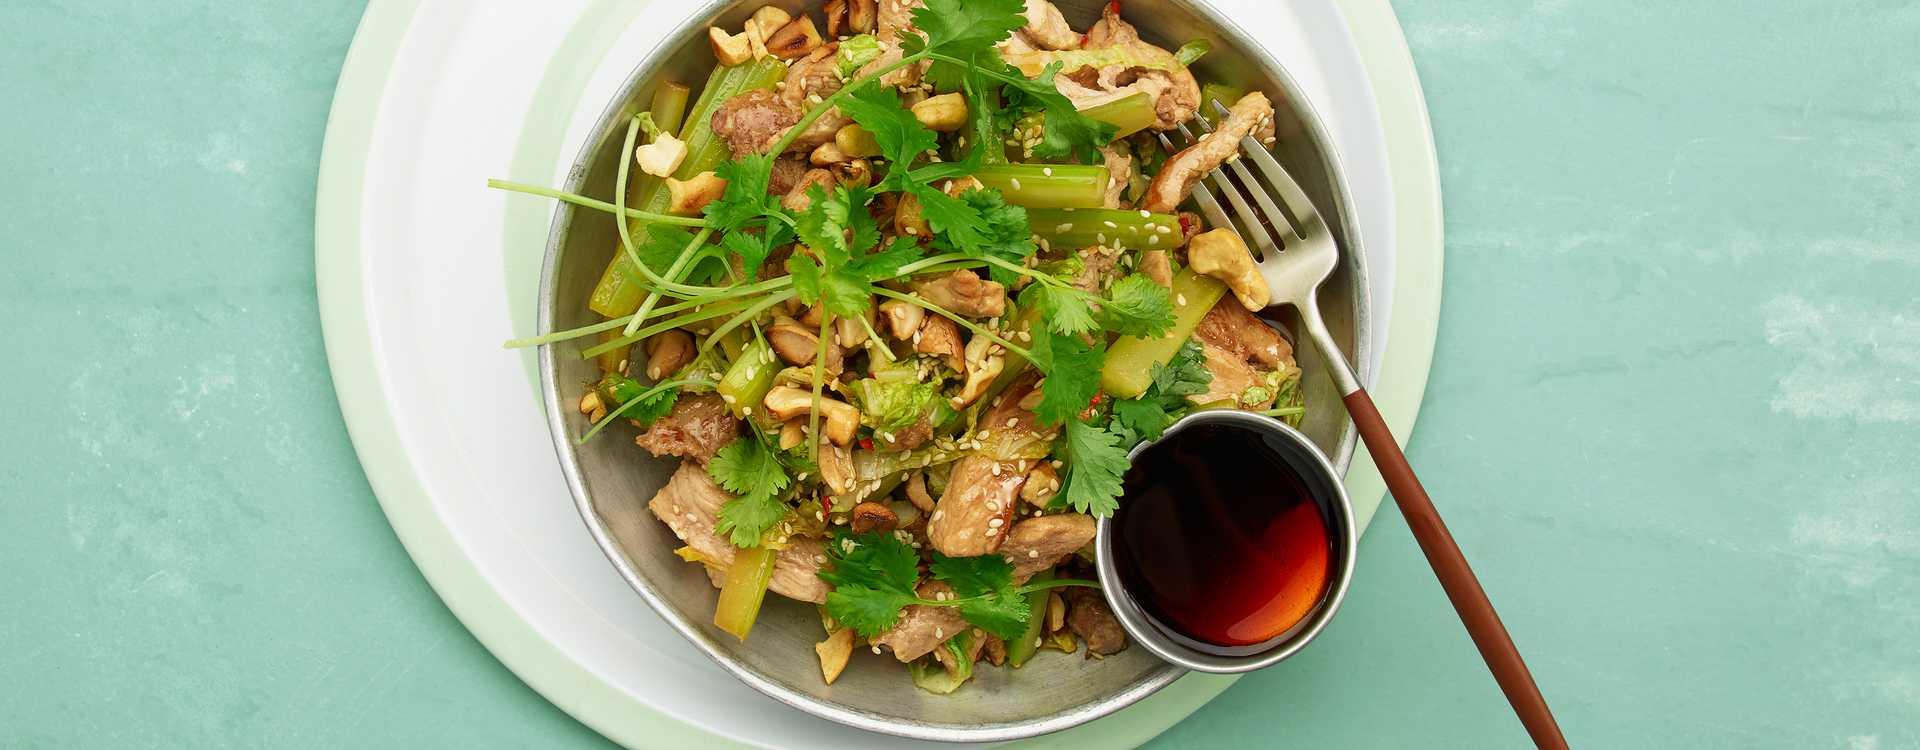 Strimlet svin med kinakål og chili